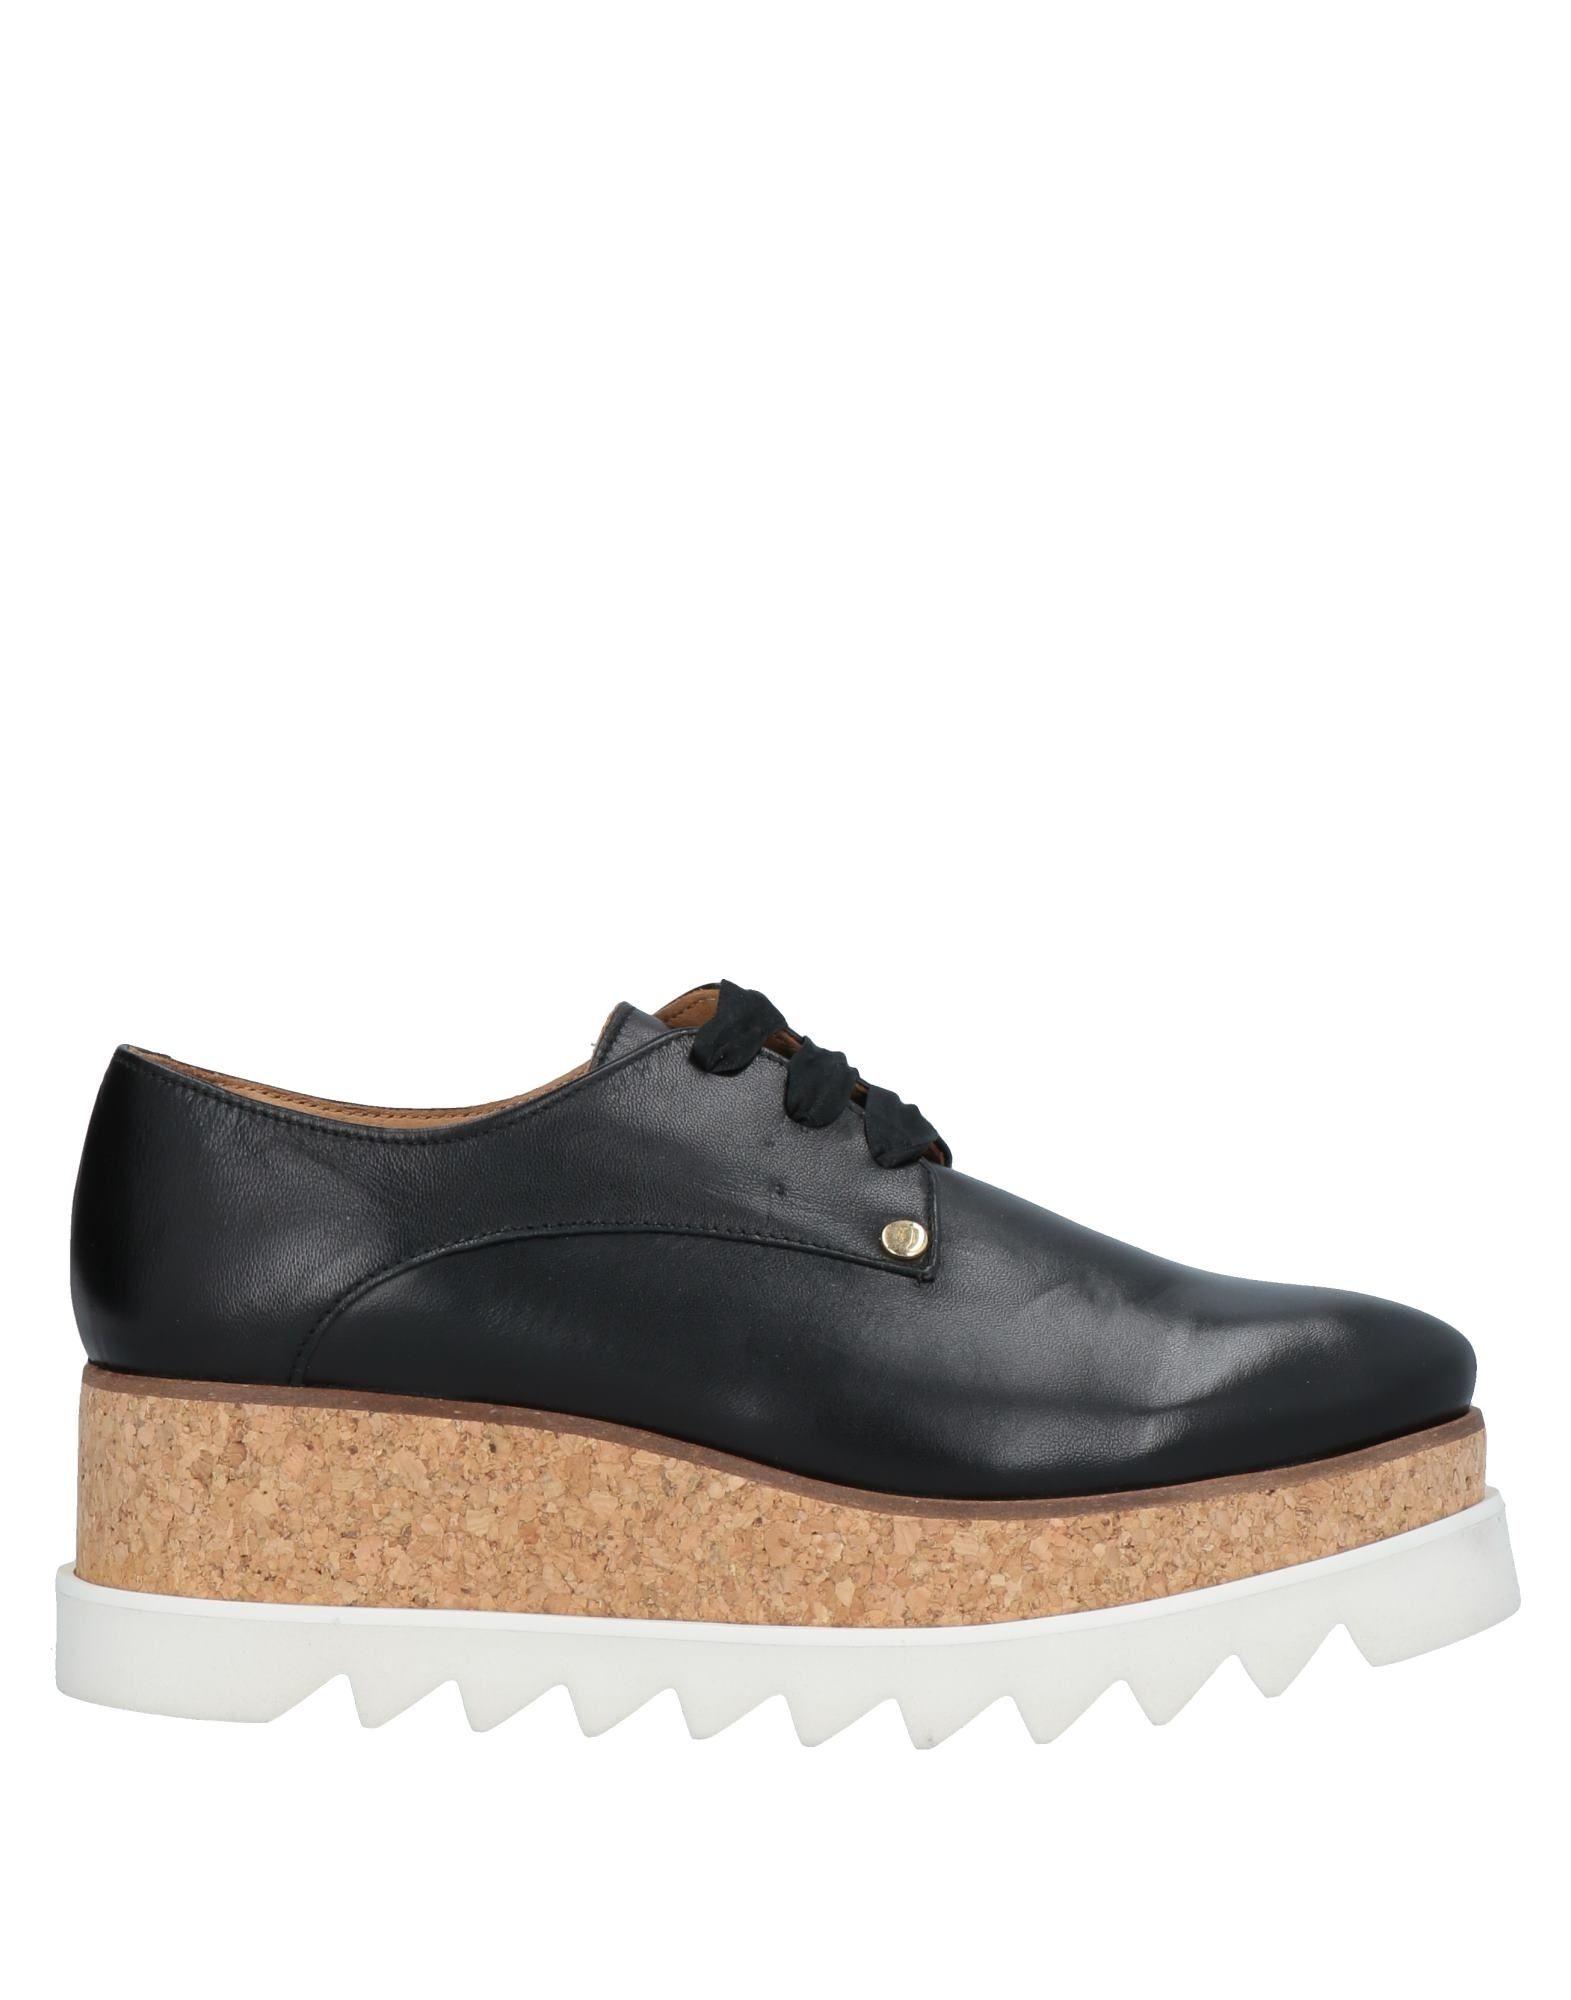 TRUSSARDI JEANS Обувь на шнурках tru trussardi обувь на шнурках